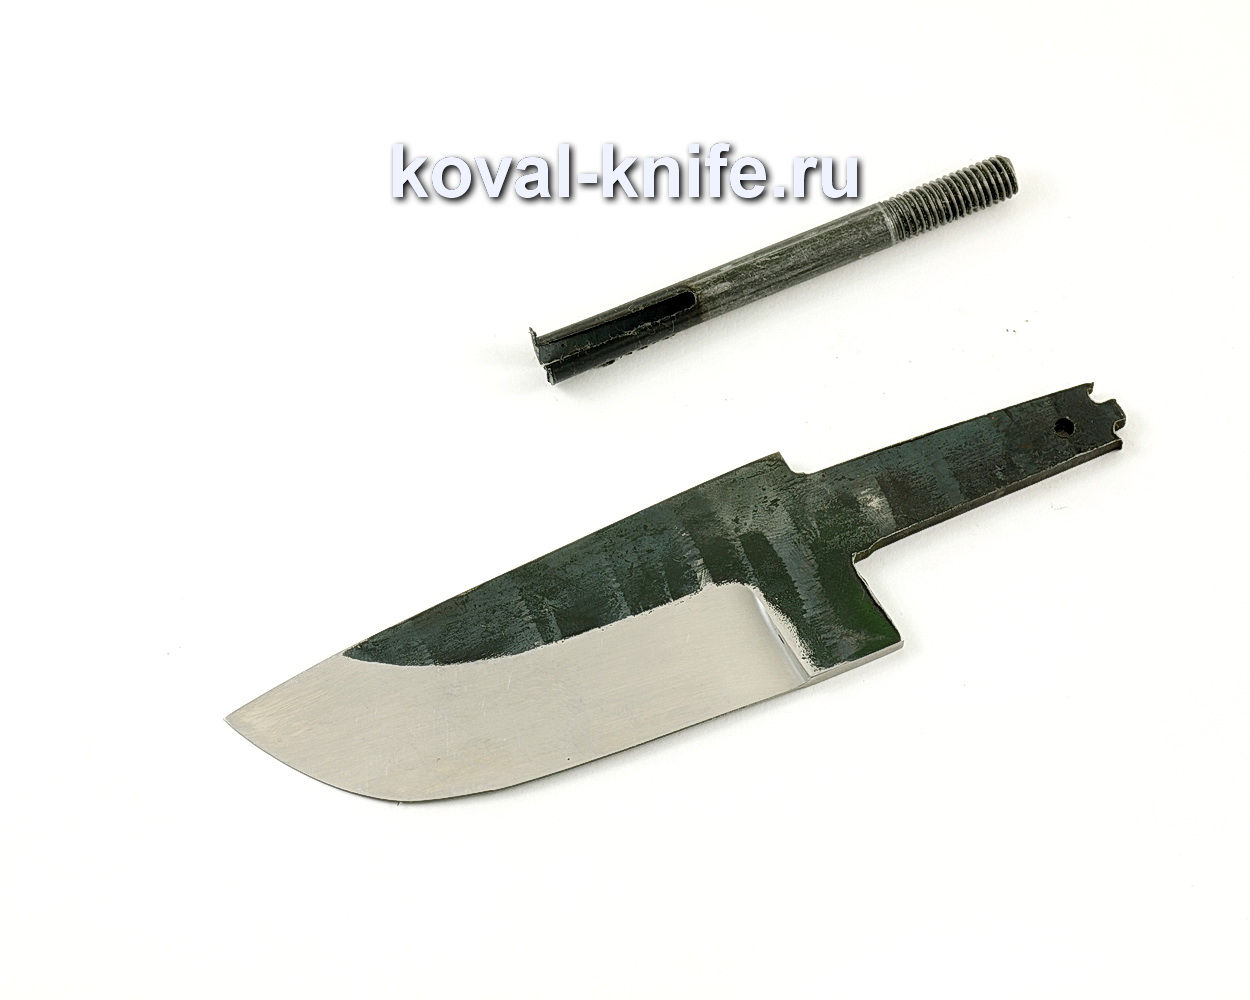 Клинок для ножа Бобр (кованая сталь 110Х18 МШД)